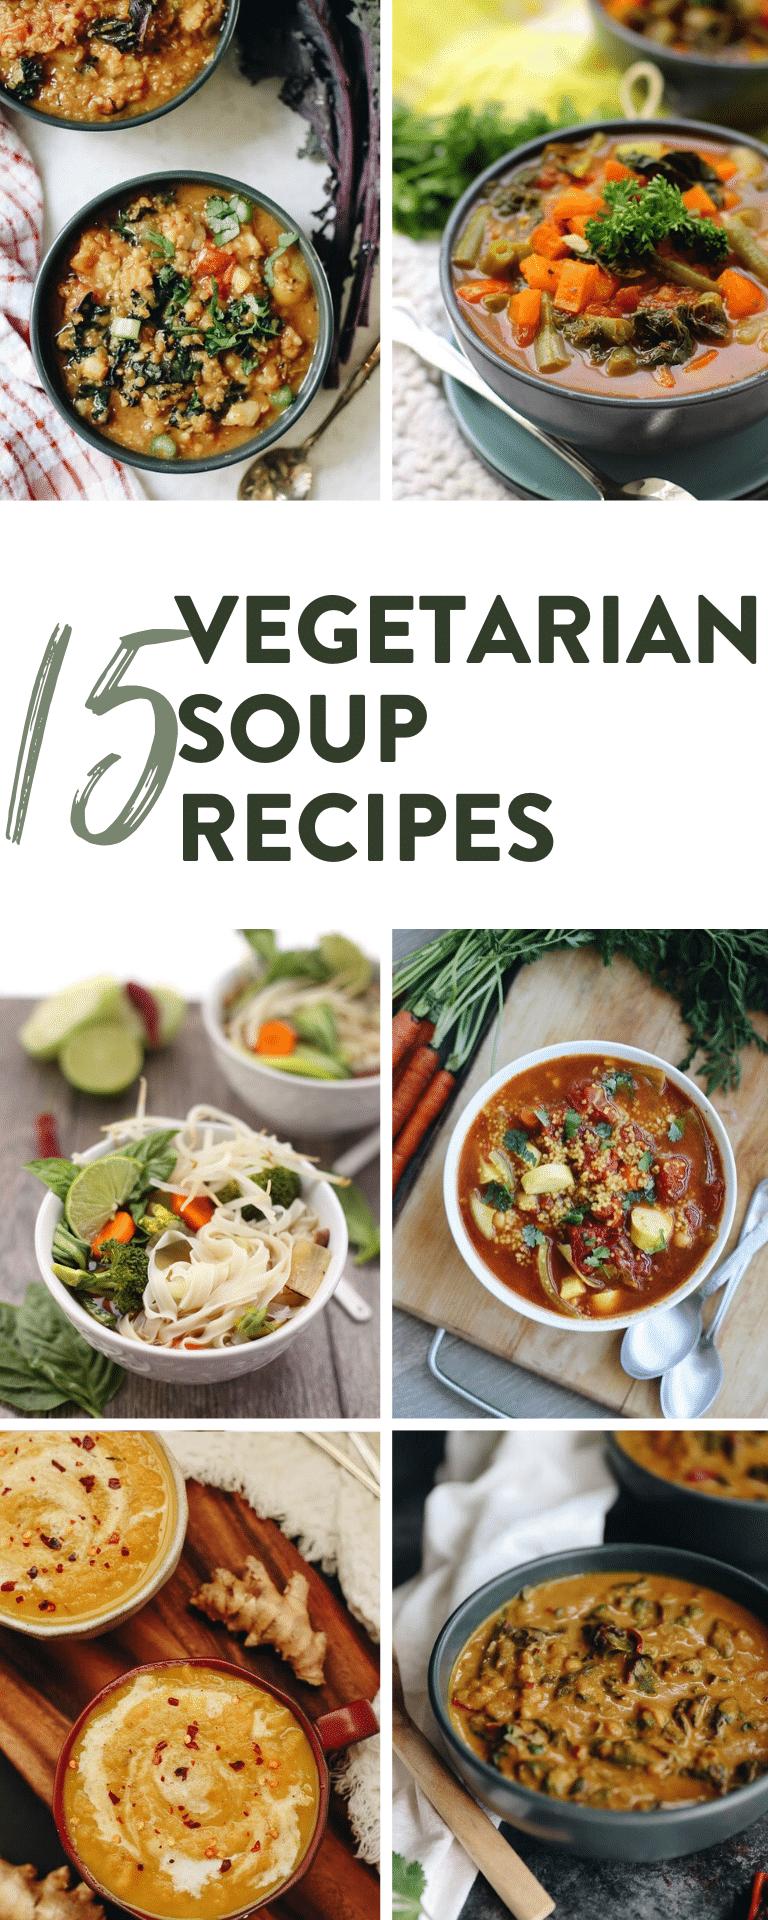 15 vegetarian soups for winter